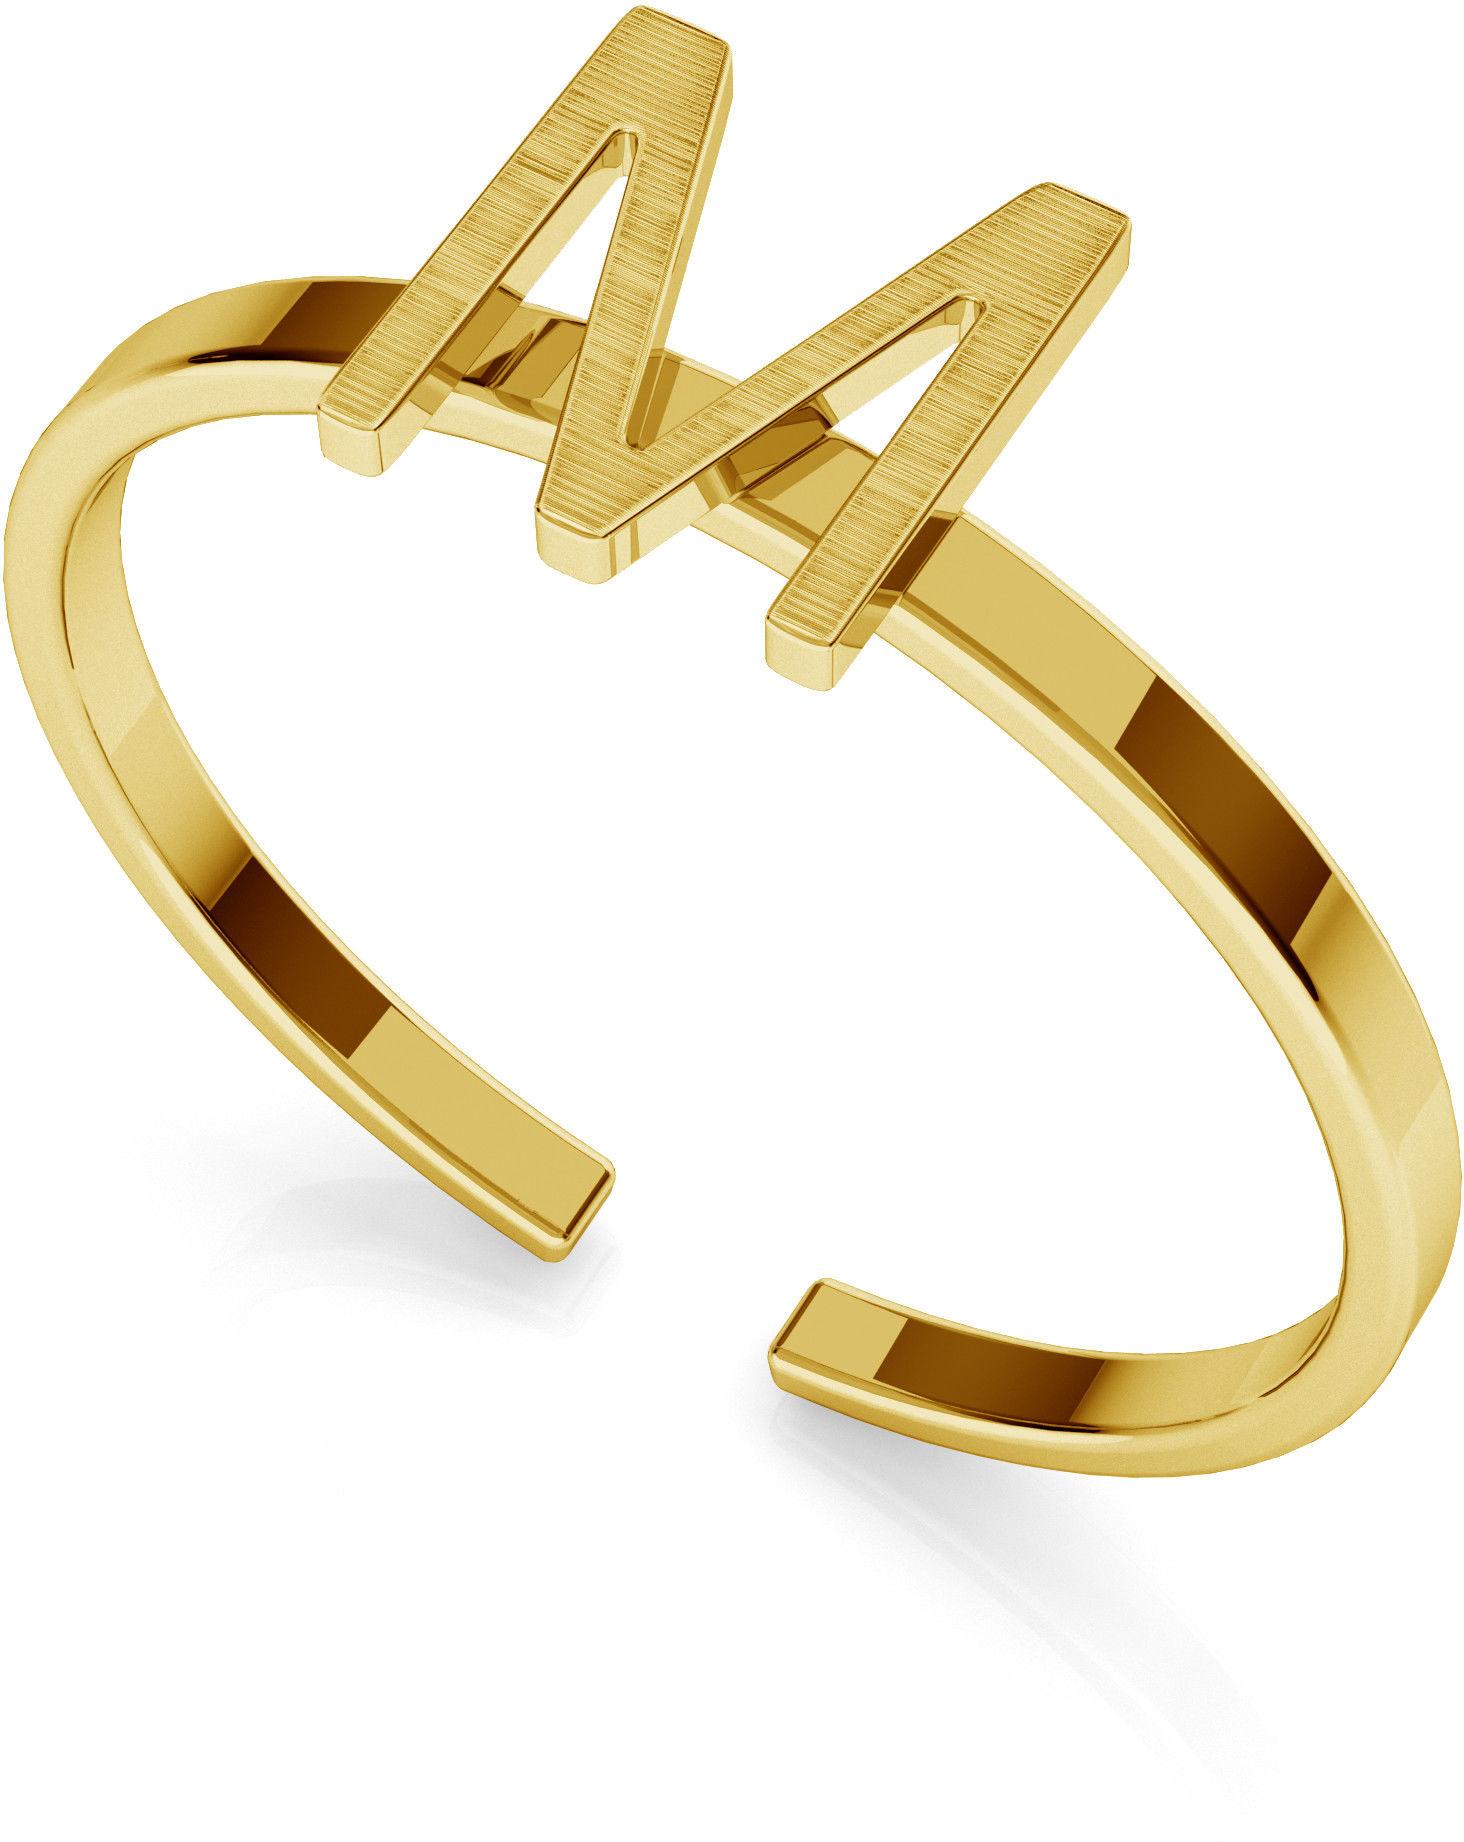 Srebrny pierścionek z literką My RING, srebro 925 : Litera - T, Srebro - kolor pokrycia - Pokrycie platyną